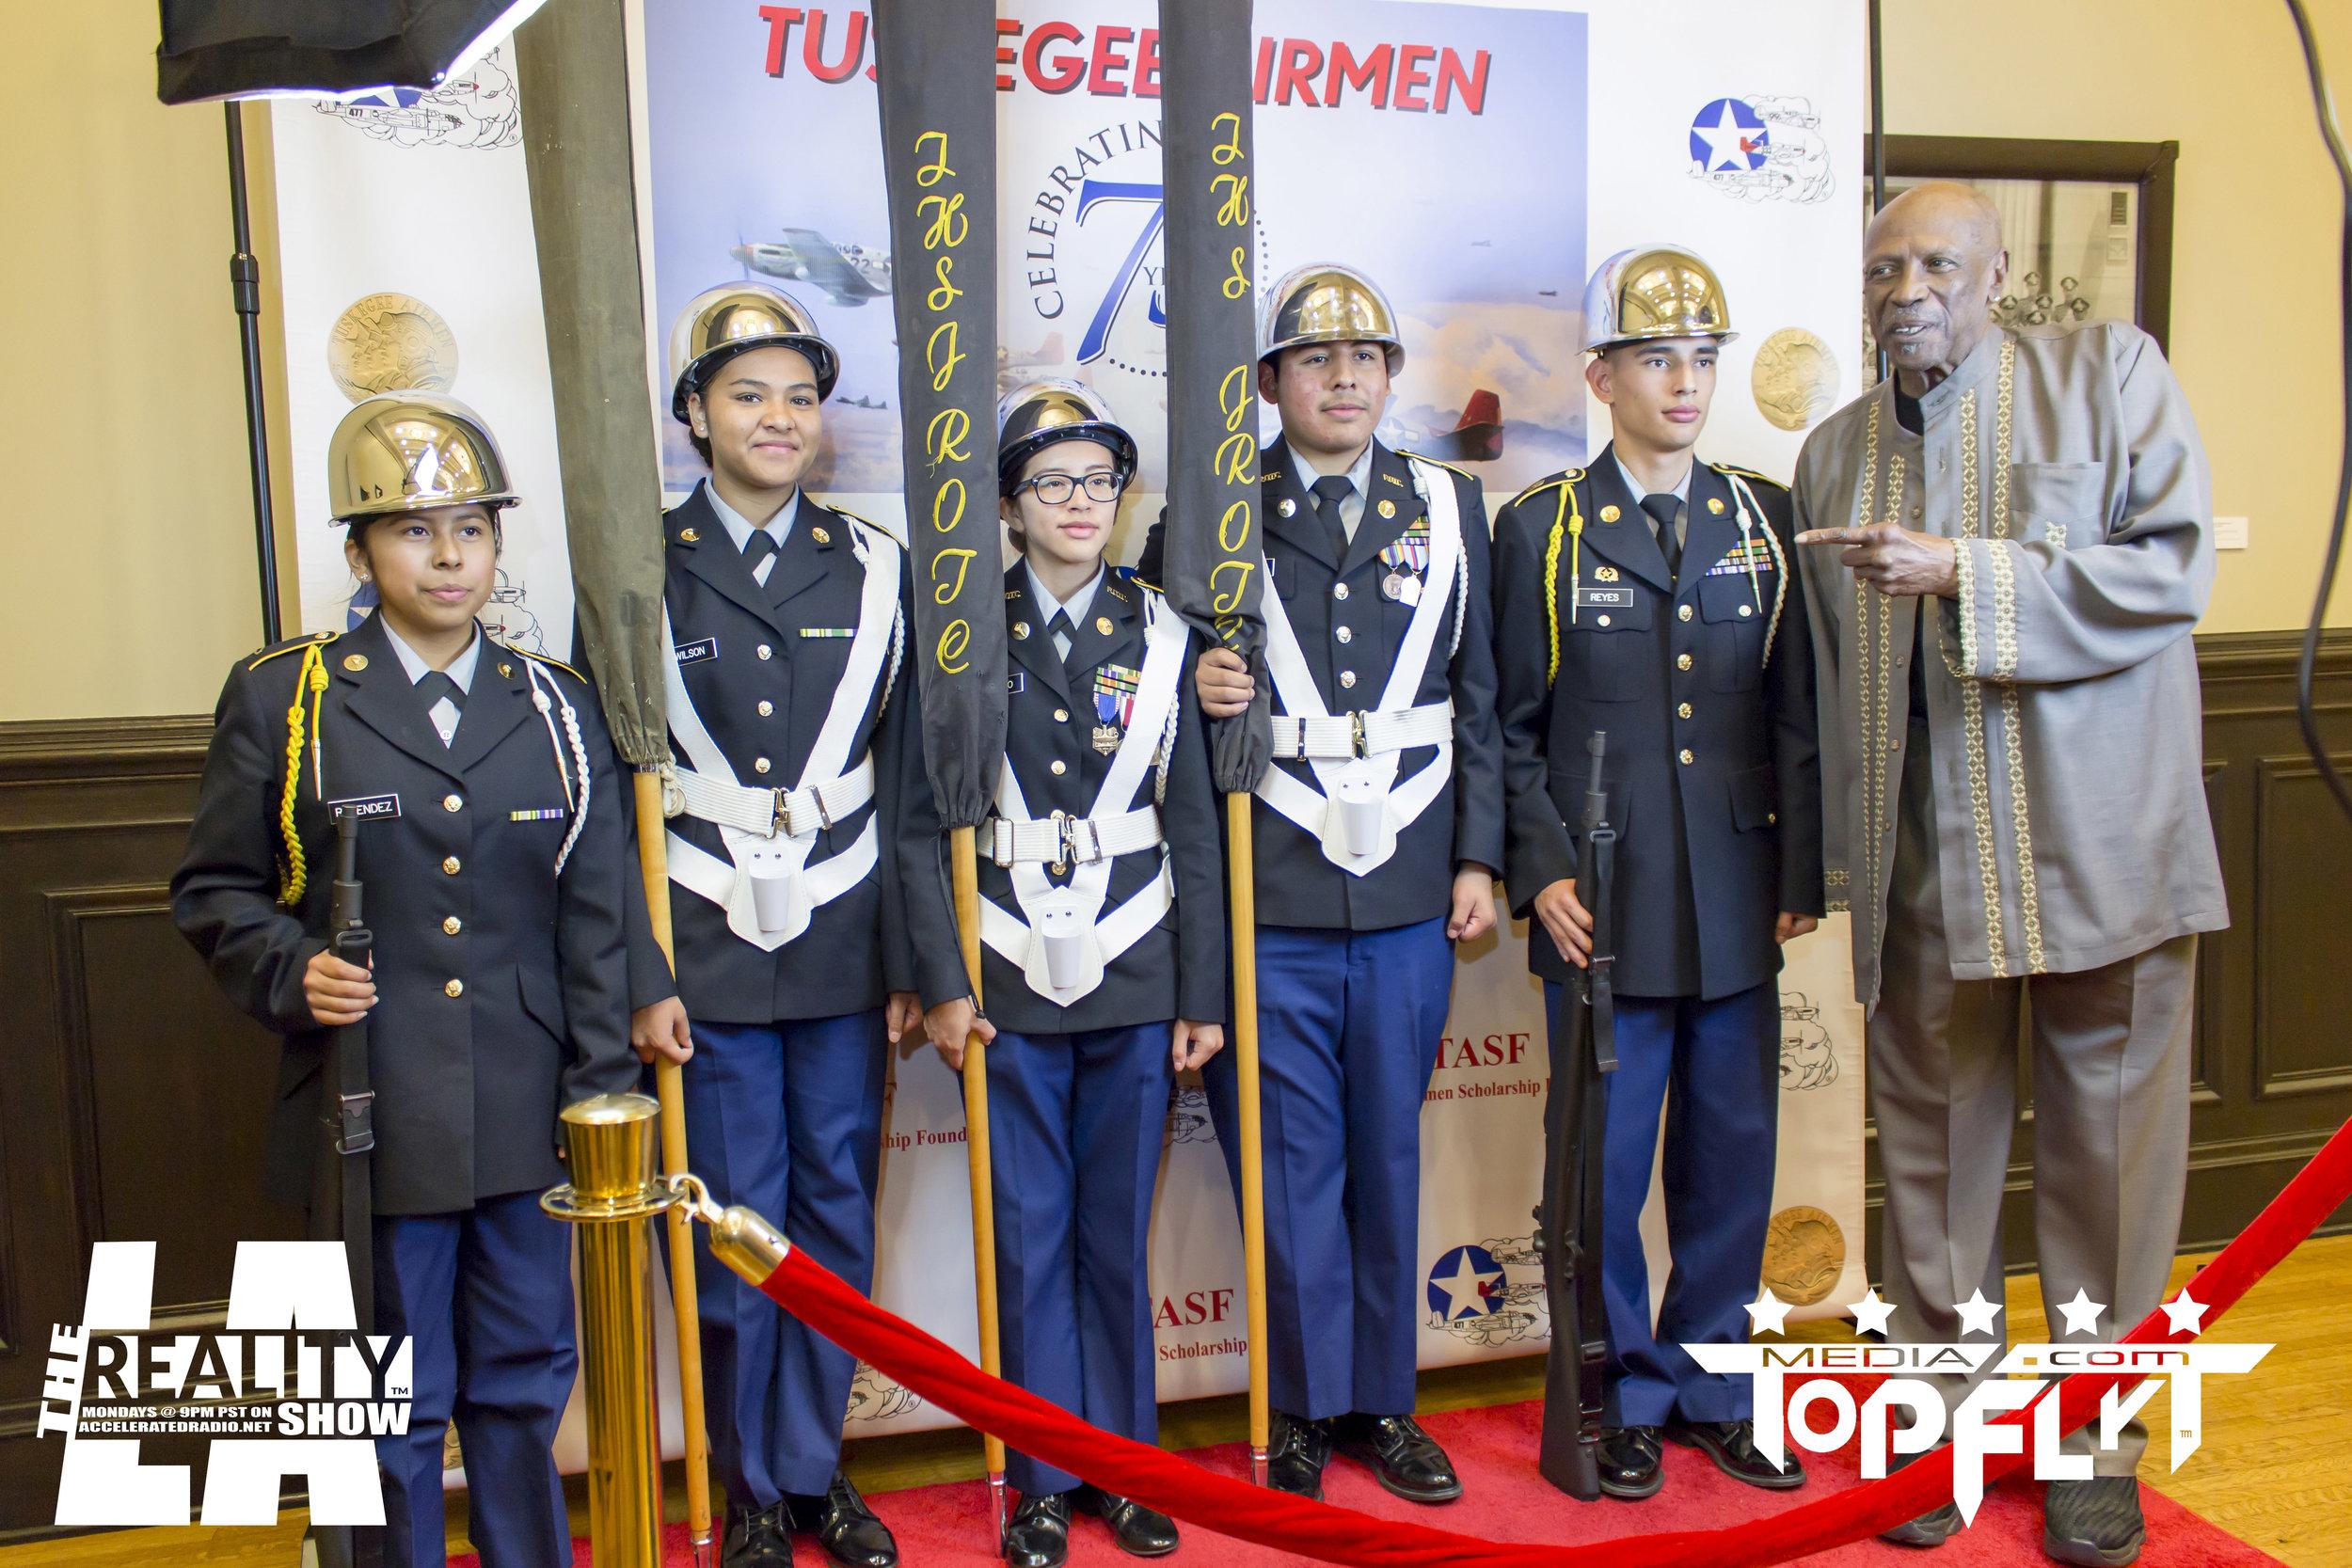 The Reality Show LA - Tuskegee Airmen 75th Anniversary VIP Reception_157.jpg